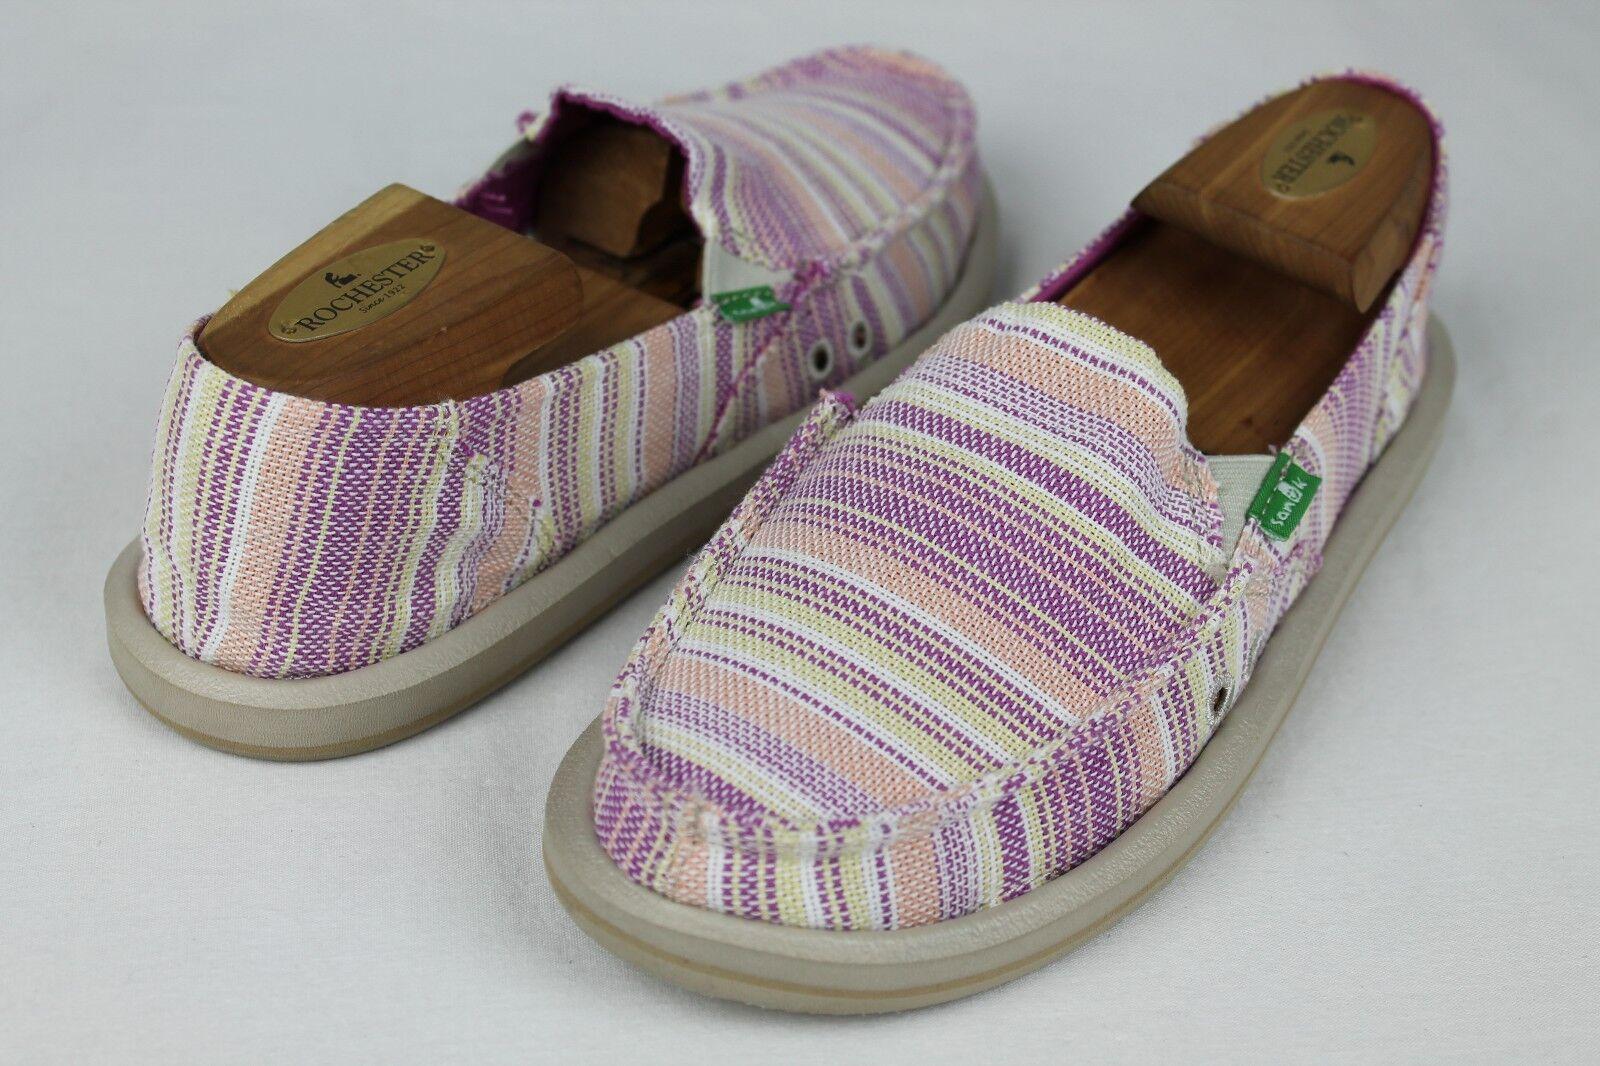 SANUK femmes CAROLINE BERRY Couleur SIDEWALK SURFER chaussures Taille 5 US